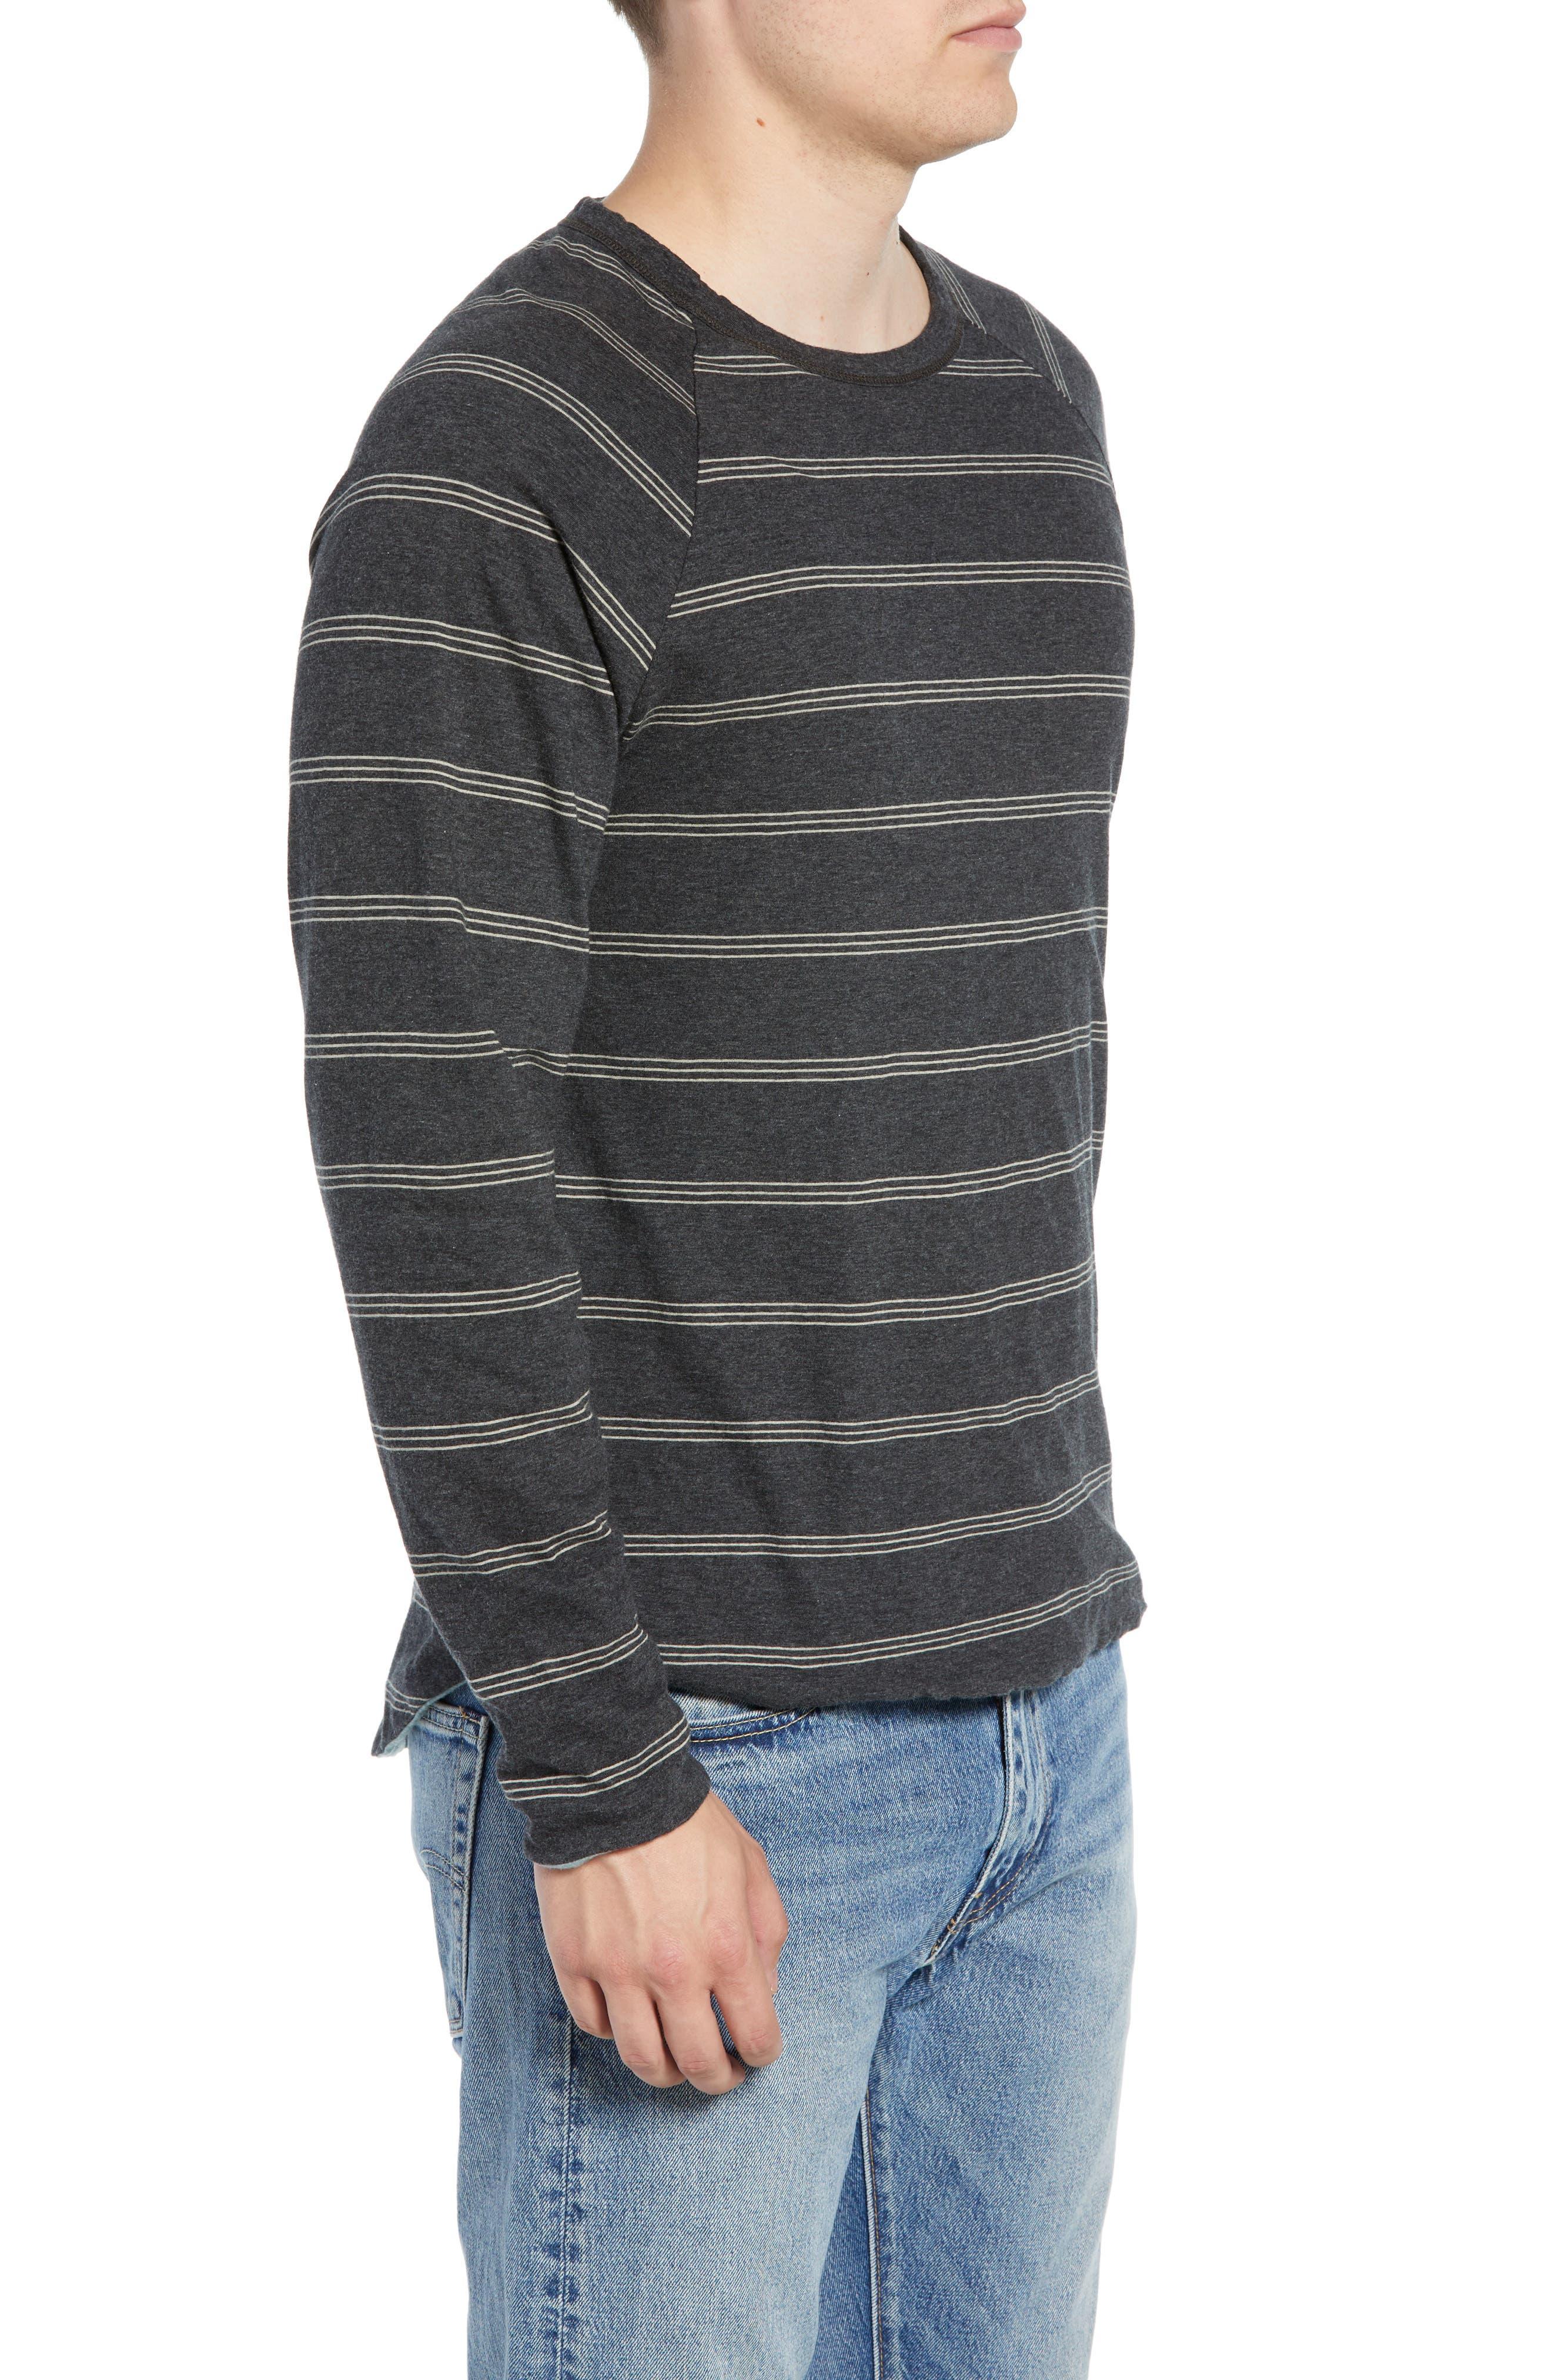 Gunnison Reversible Raglan Sleeve T-Shirt,                             Alternate thumbnail 4, color,                             PHANTOM HEATHER